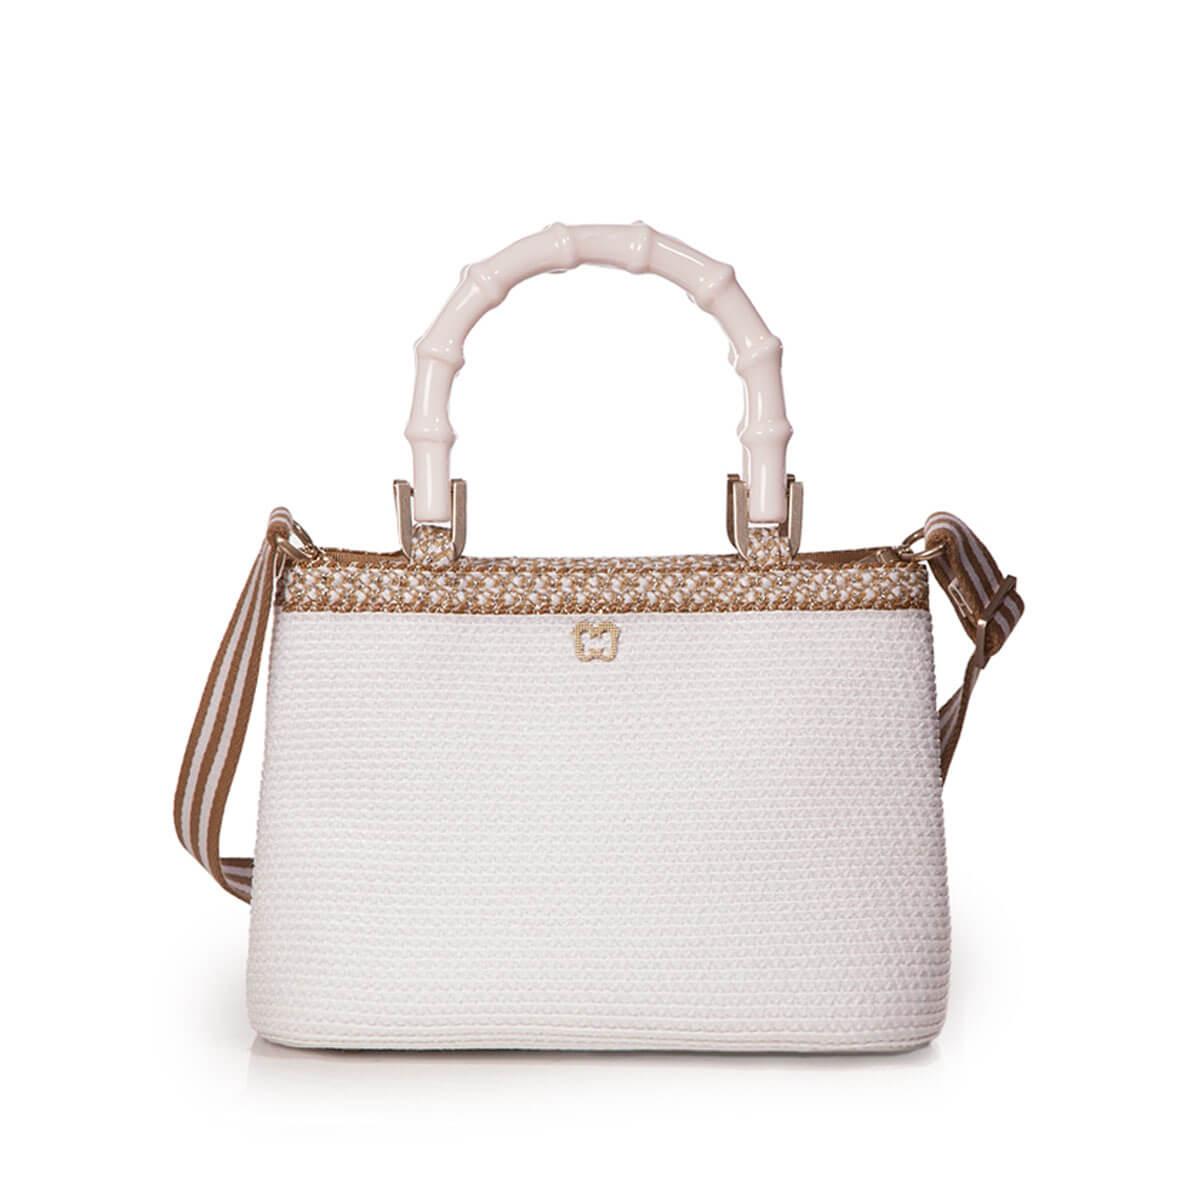 1f9d704790357d Eric Javits Luxury Fashion Designer Women's Handbags - Leila - Final Sale 0